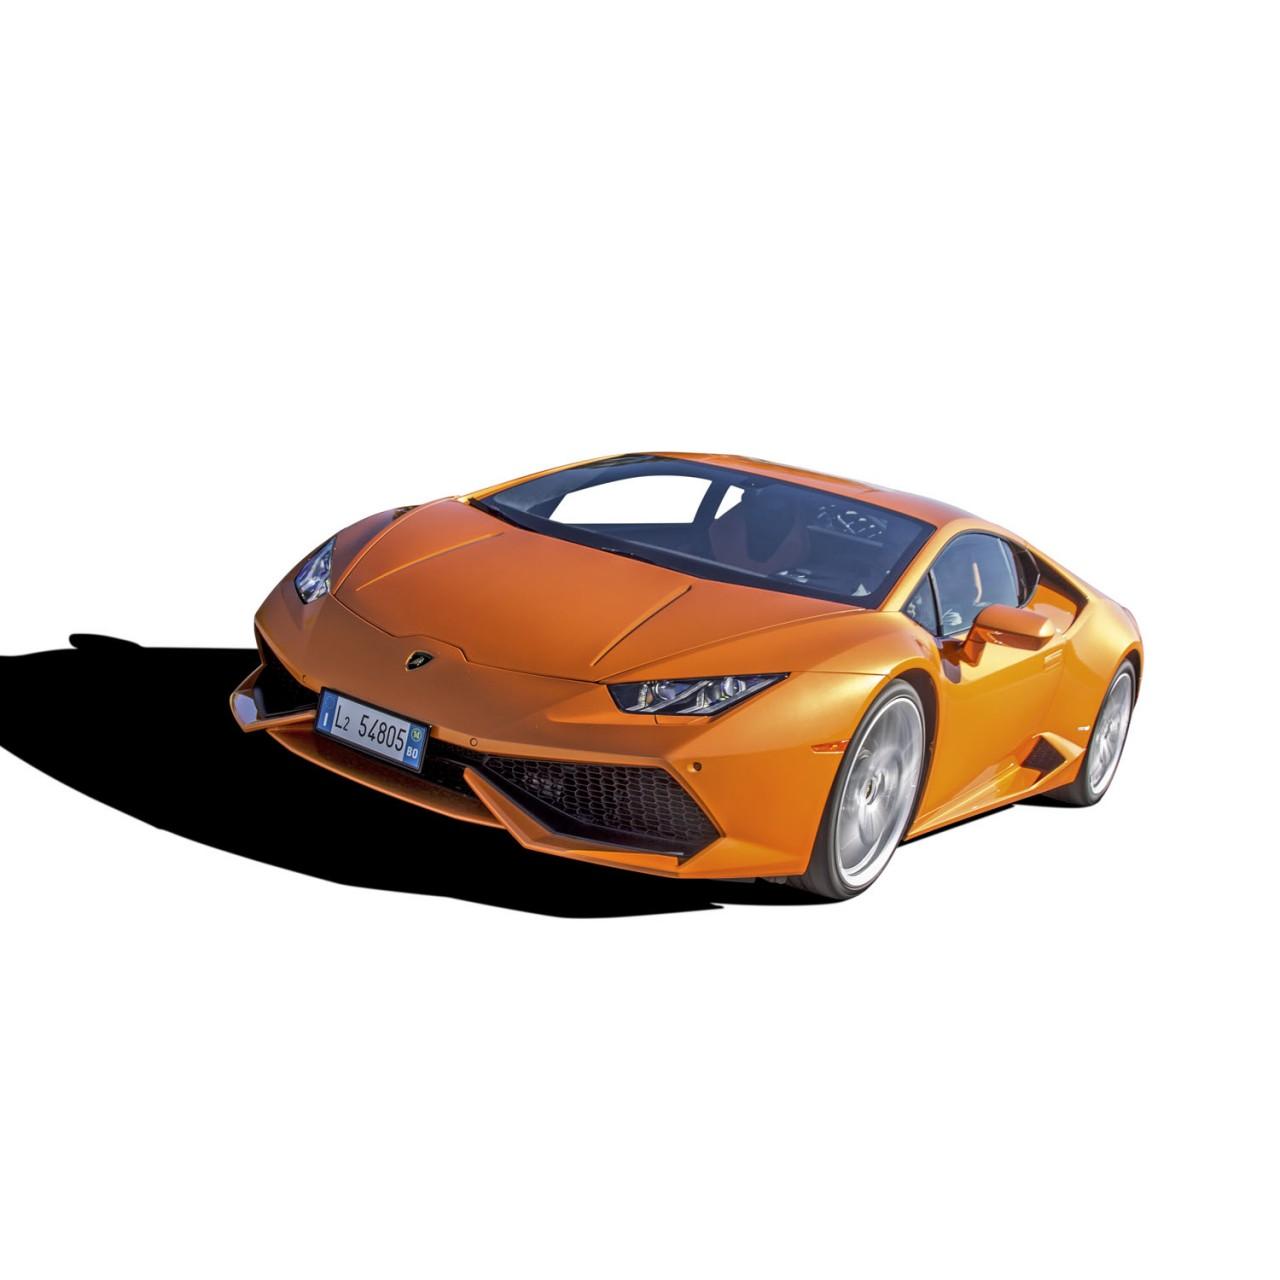 Lamborghini Huracan modello